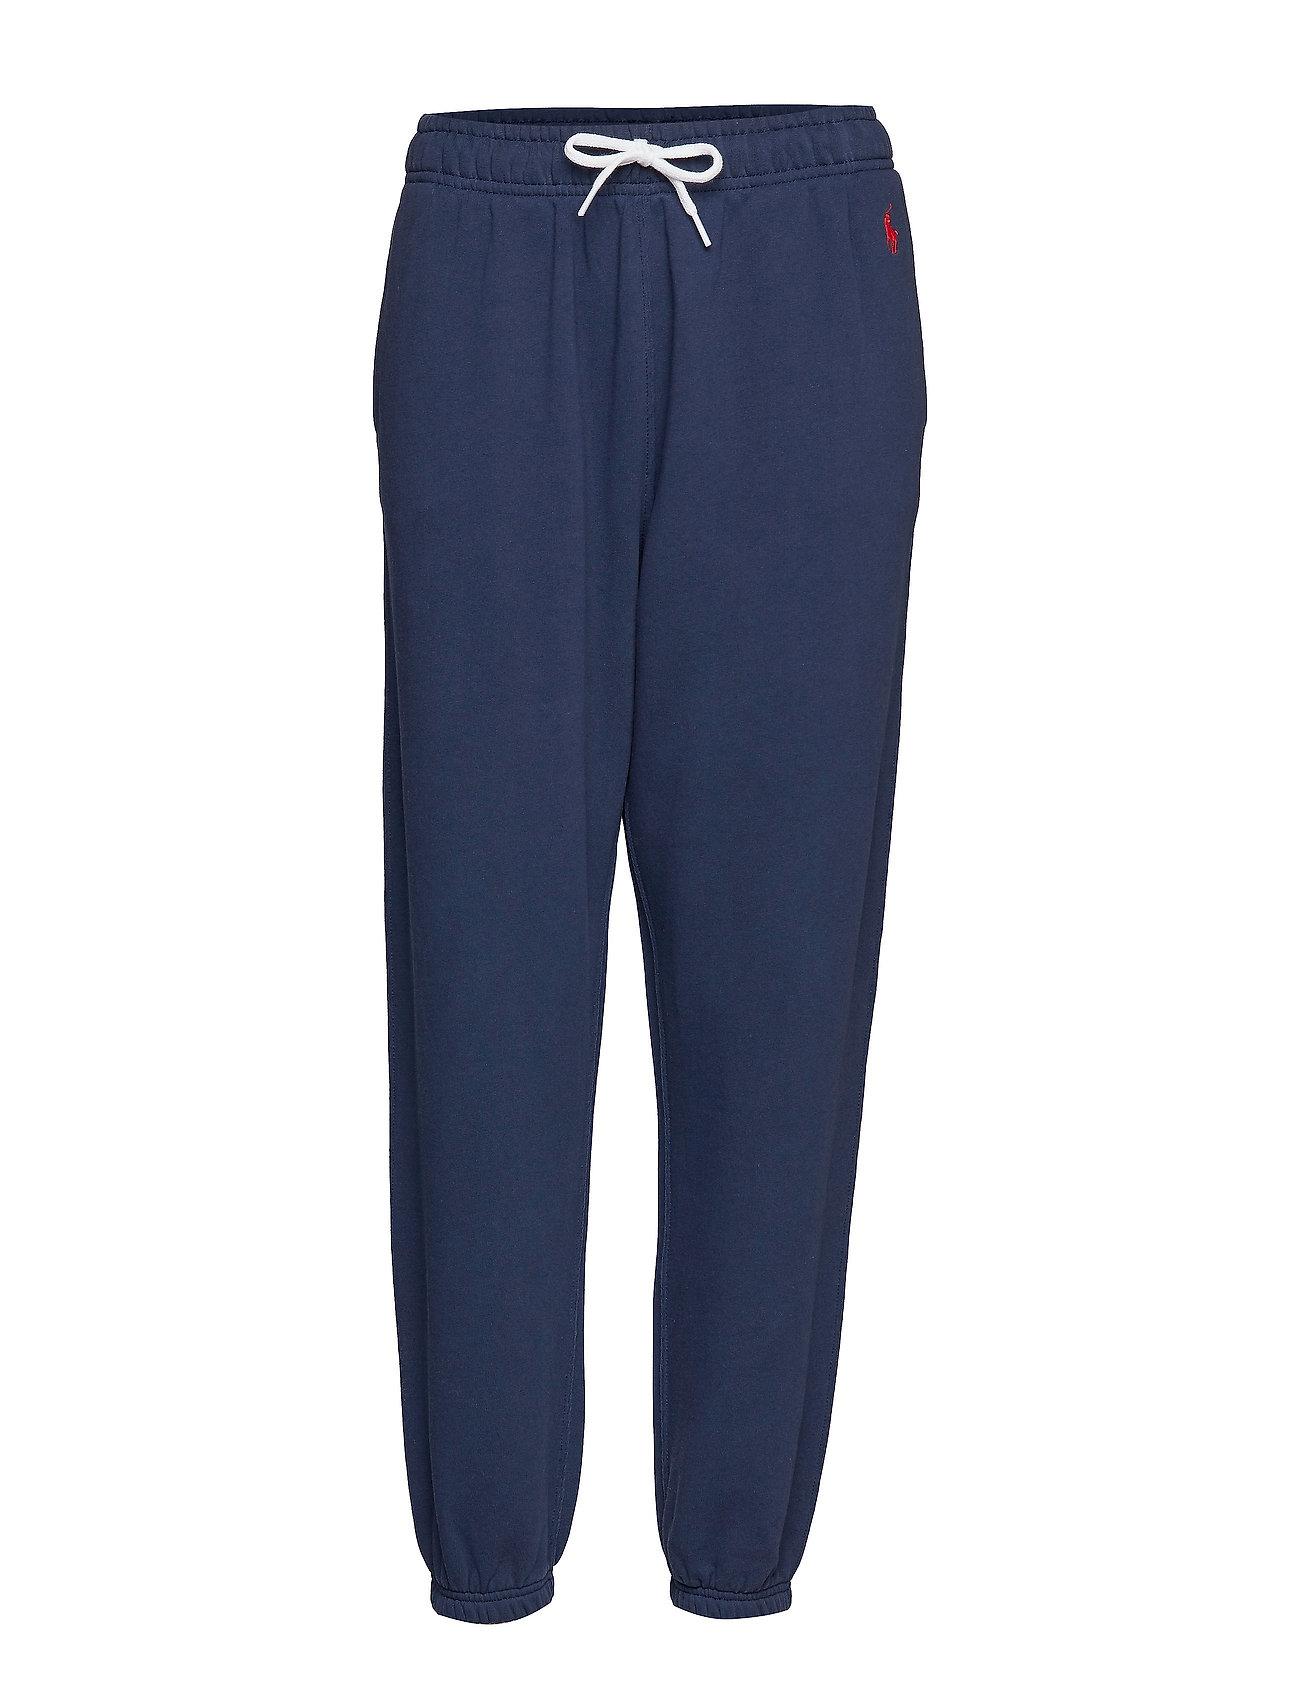 Polo Ralph Lauren Fleece Sweatpant - CRUISE NAVY